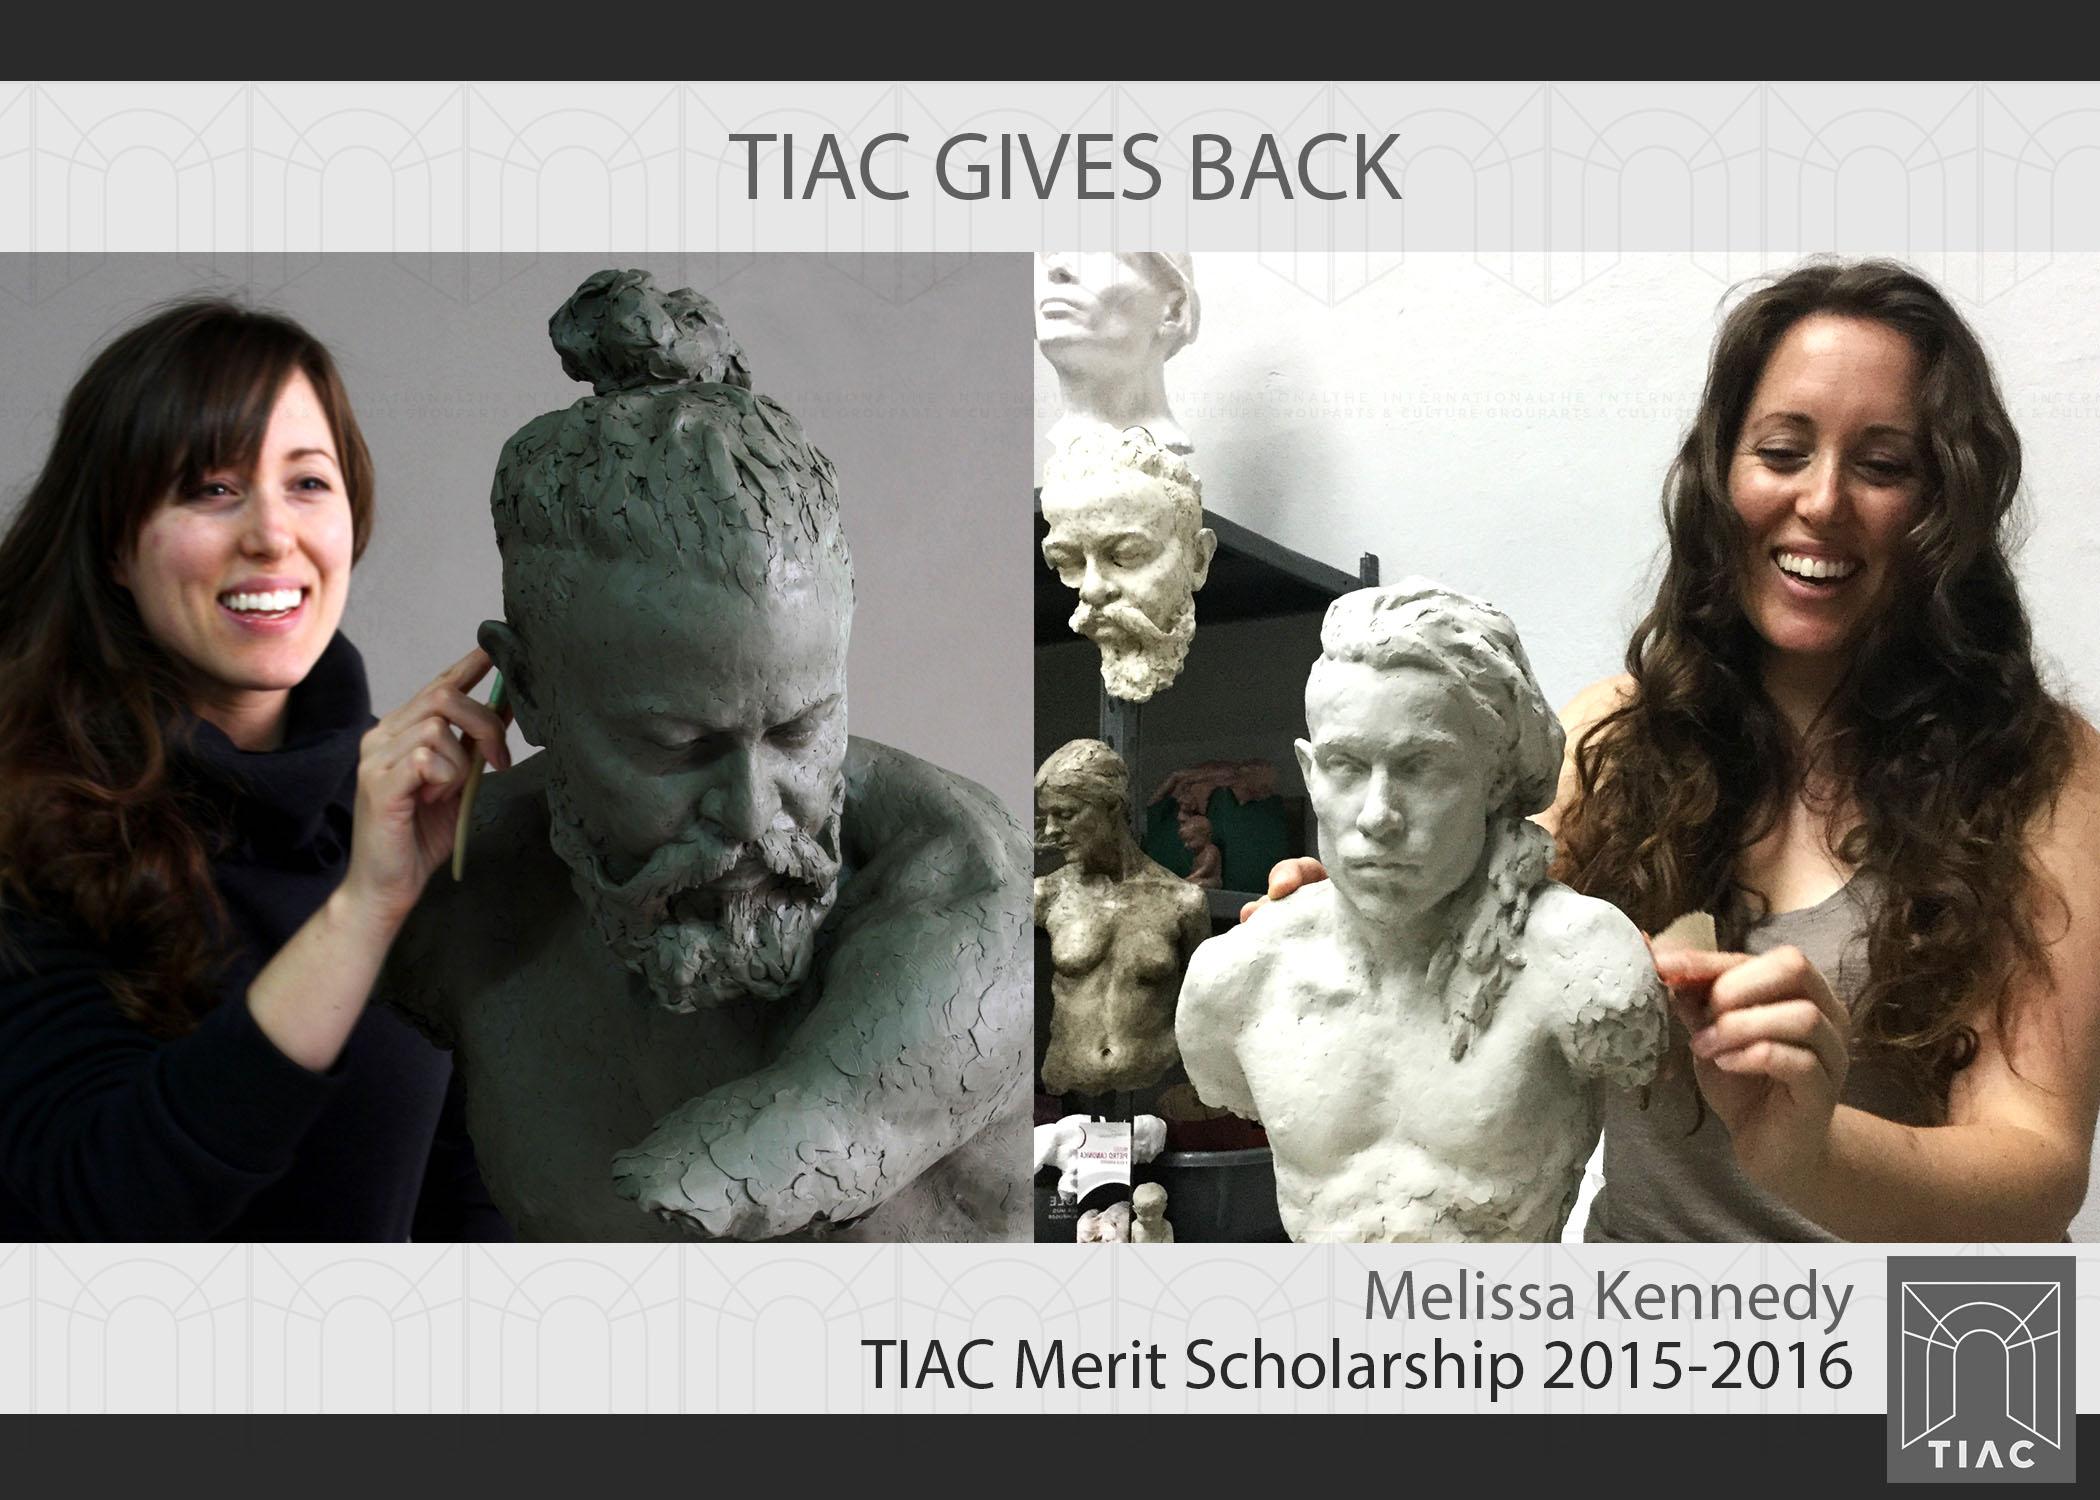 TIAc-Gives_Back_Scholarships_Melissa Kennedy.jpg